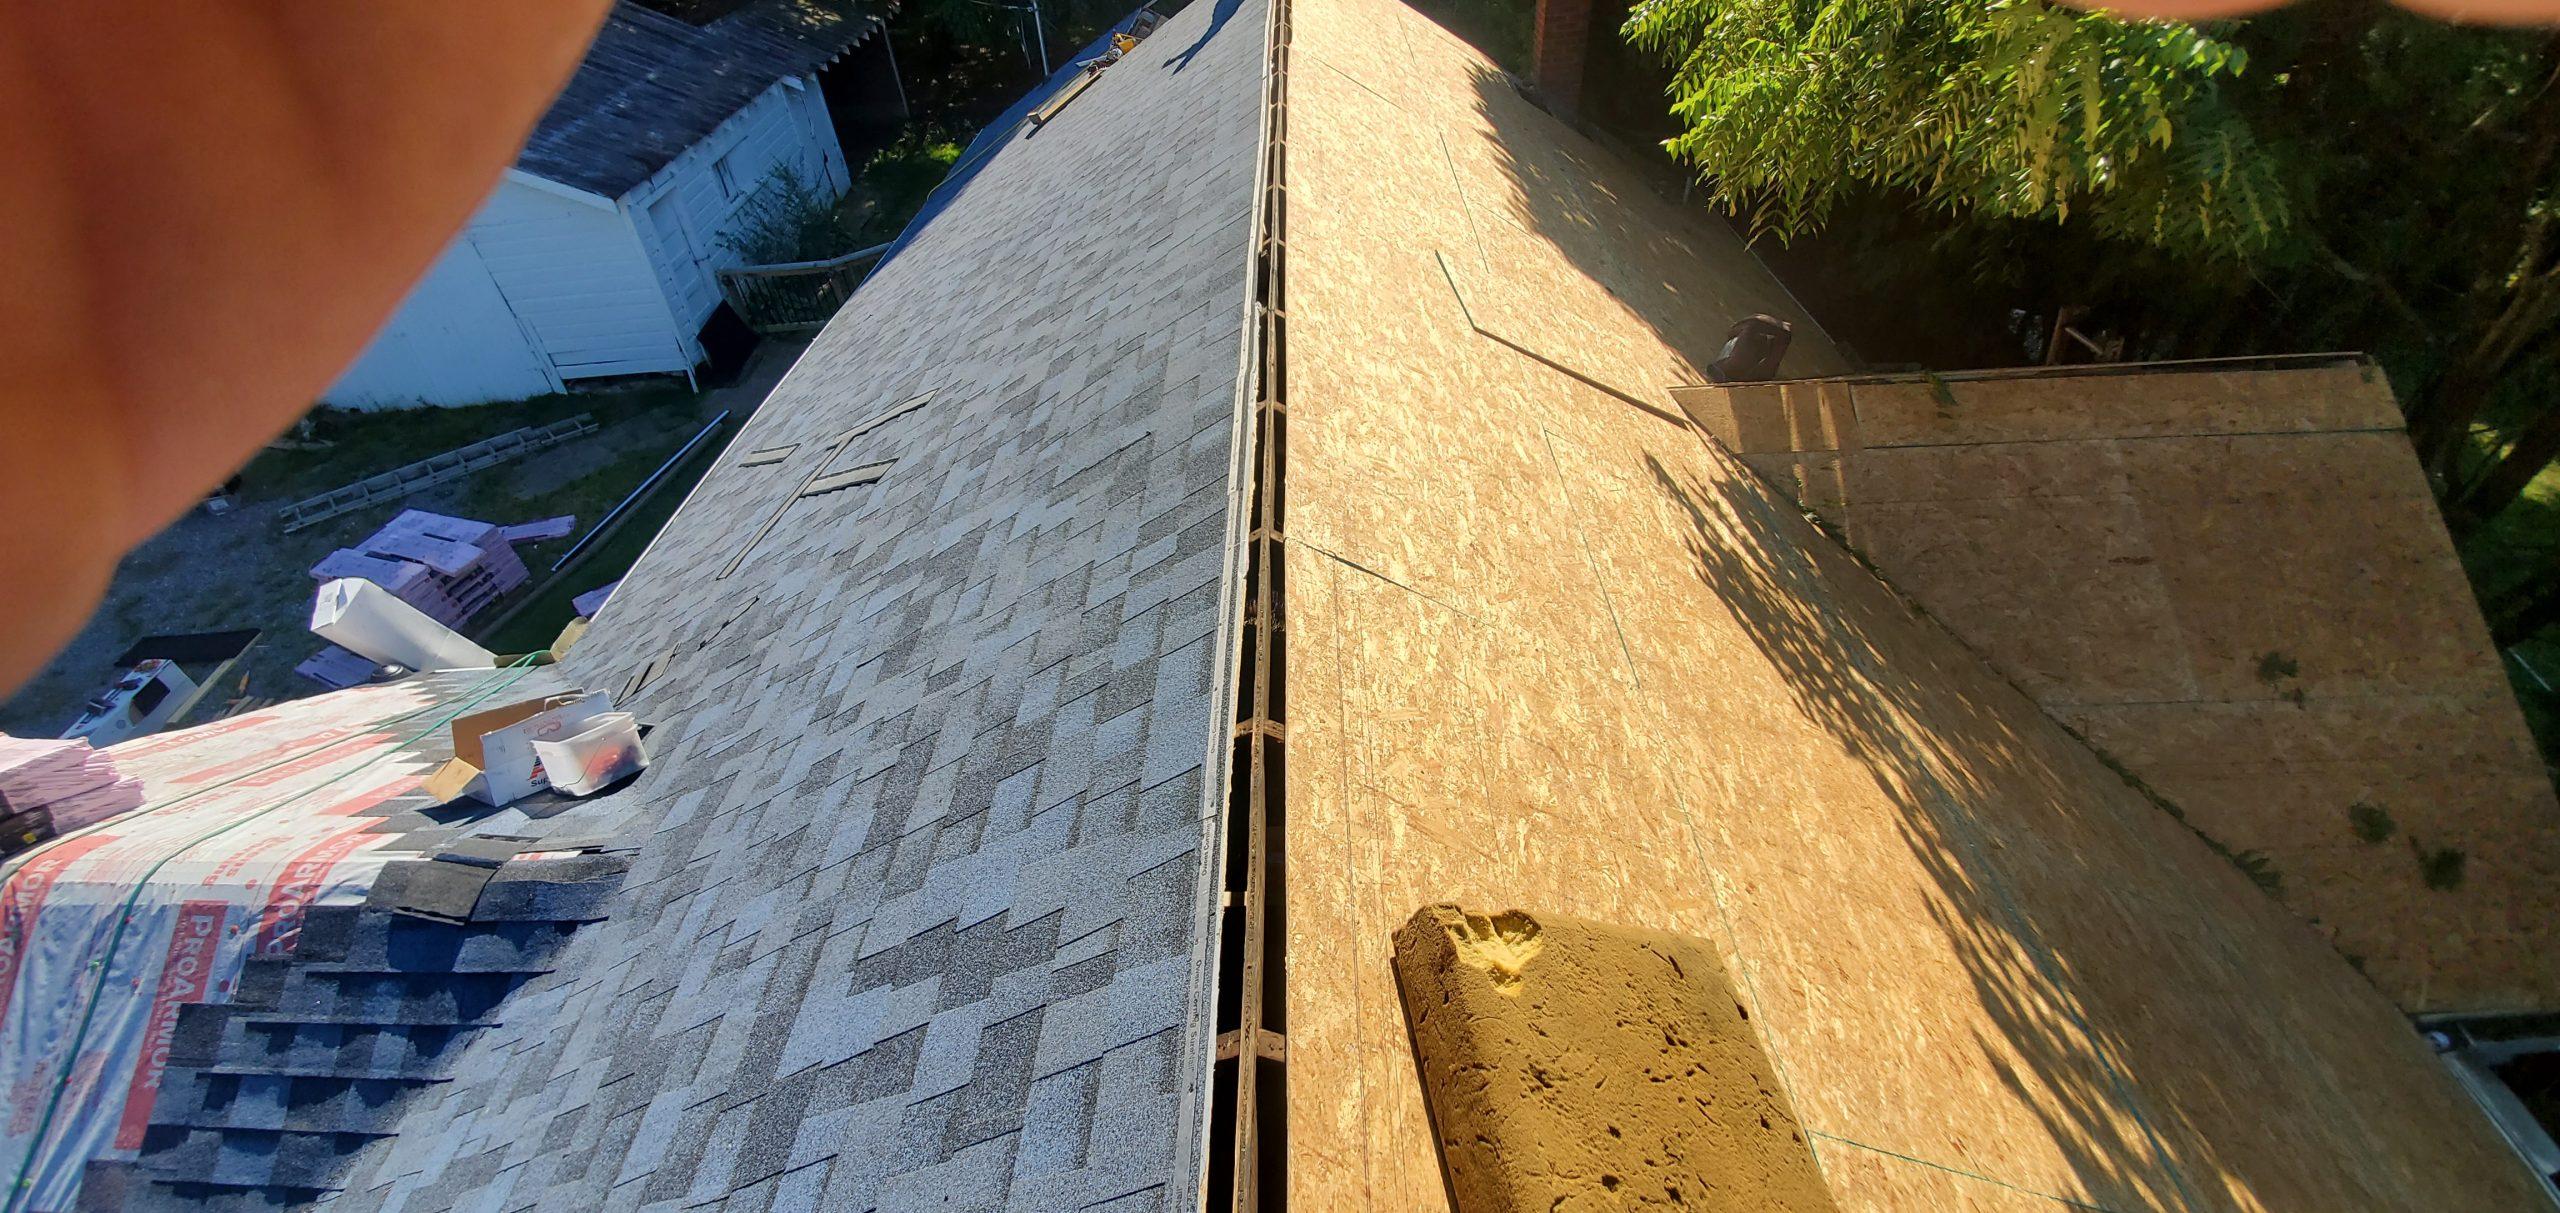 Ridge vent allows proper ventilation